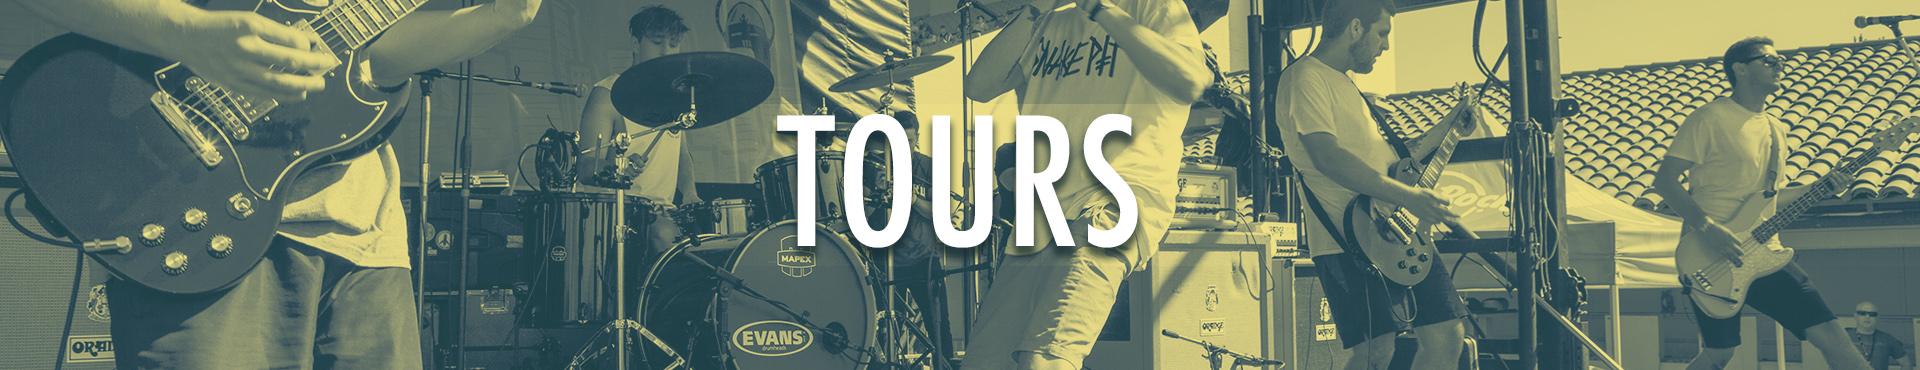 hopeless_web_banners-head_Tours 2B.jpg